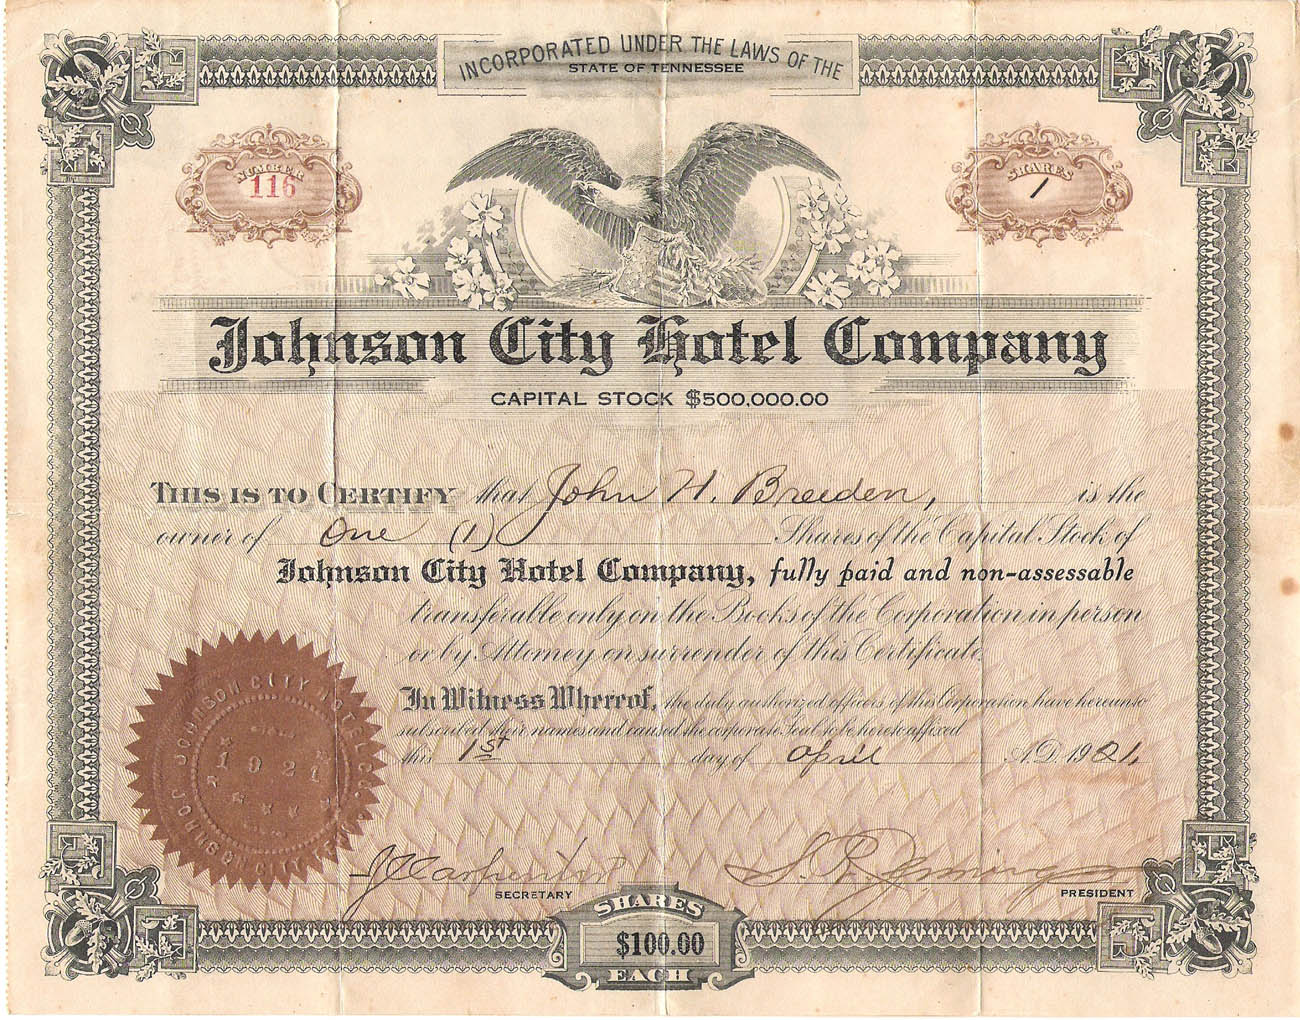 Little Chicago Johnson City Tennessee